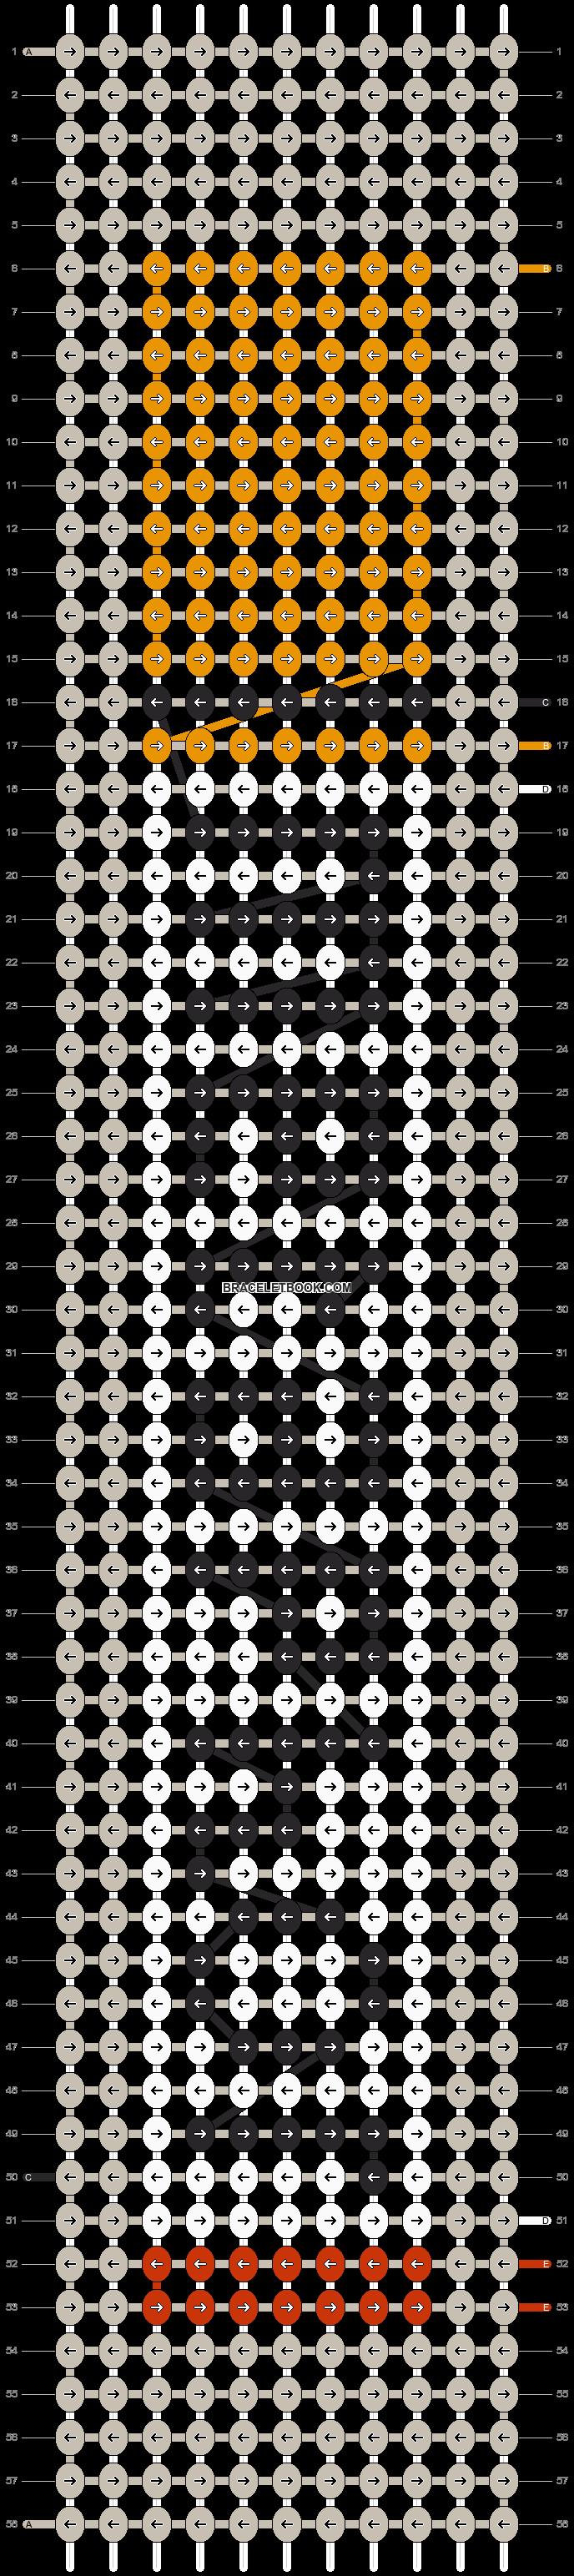 Alpha pattern #13241 pattern